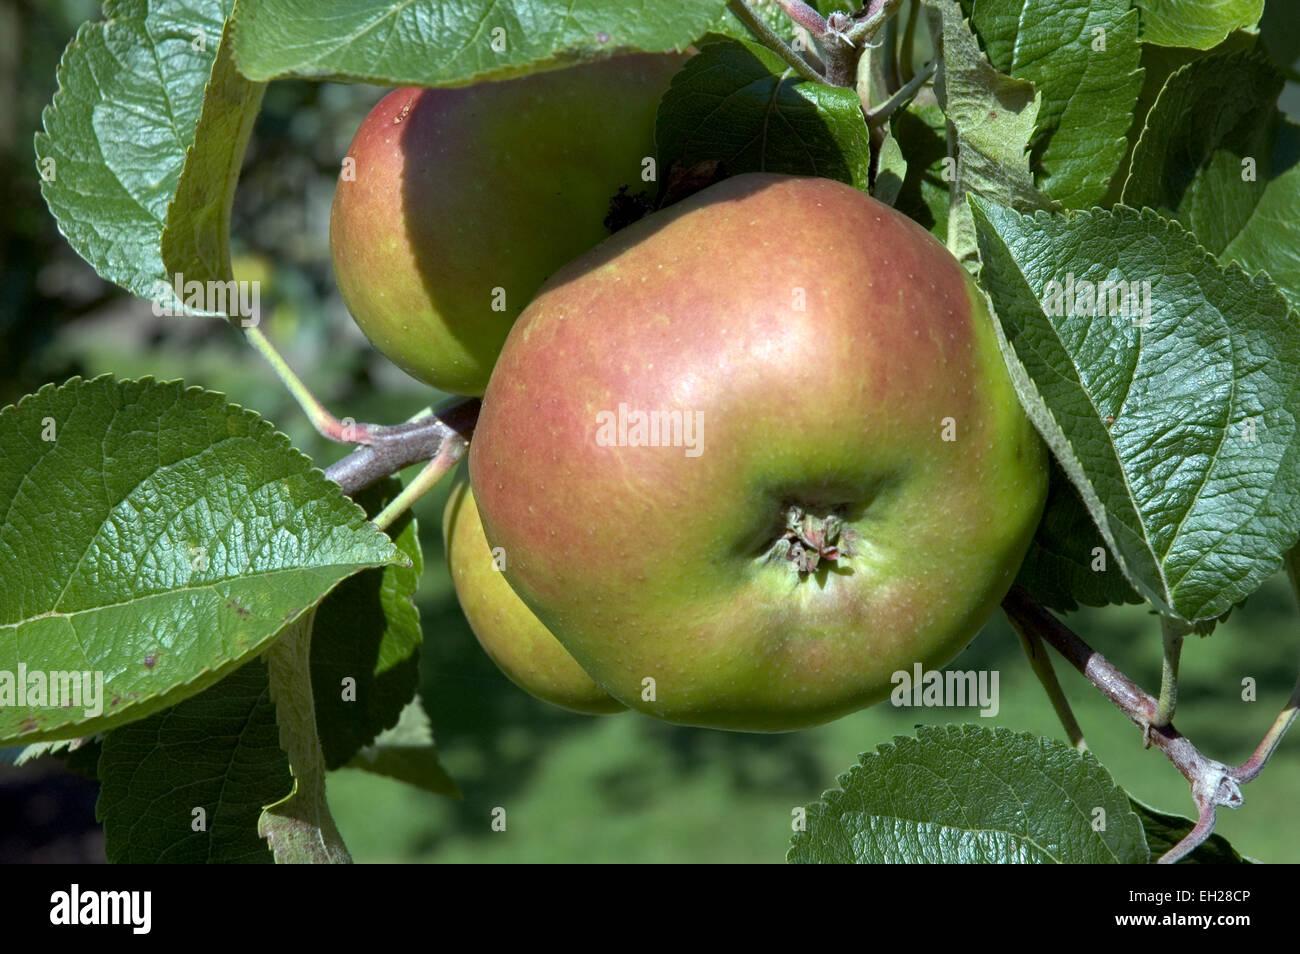 Bramley Apfel auf dem Baum Stockbild